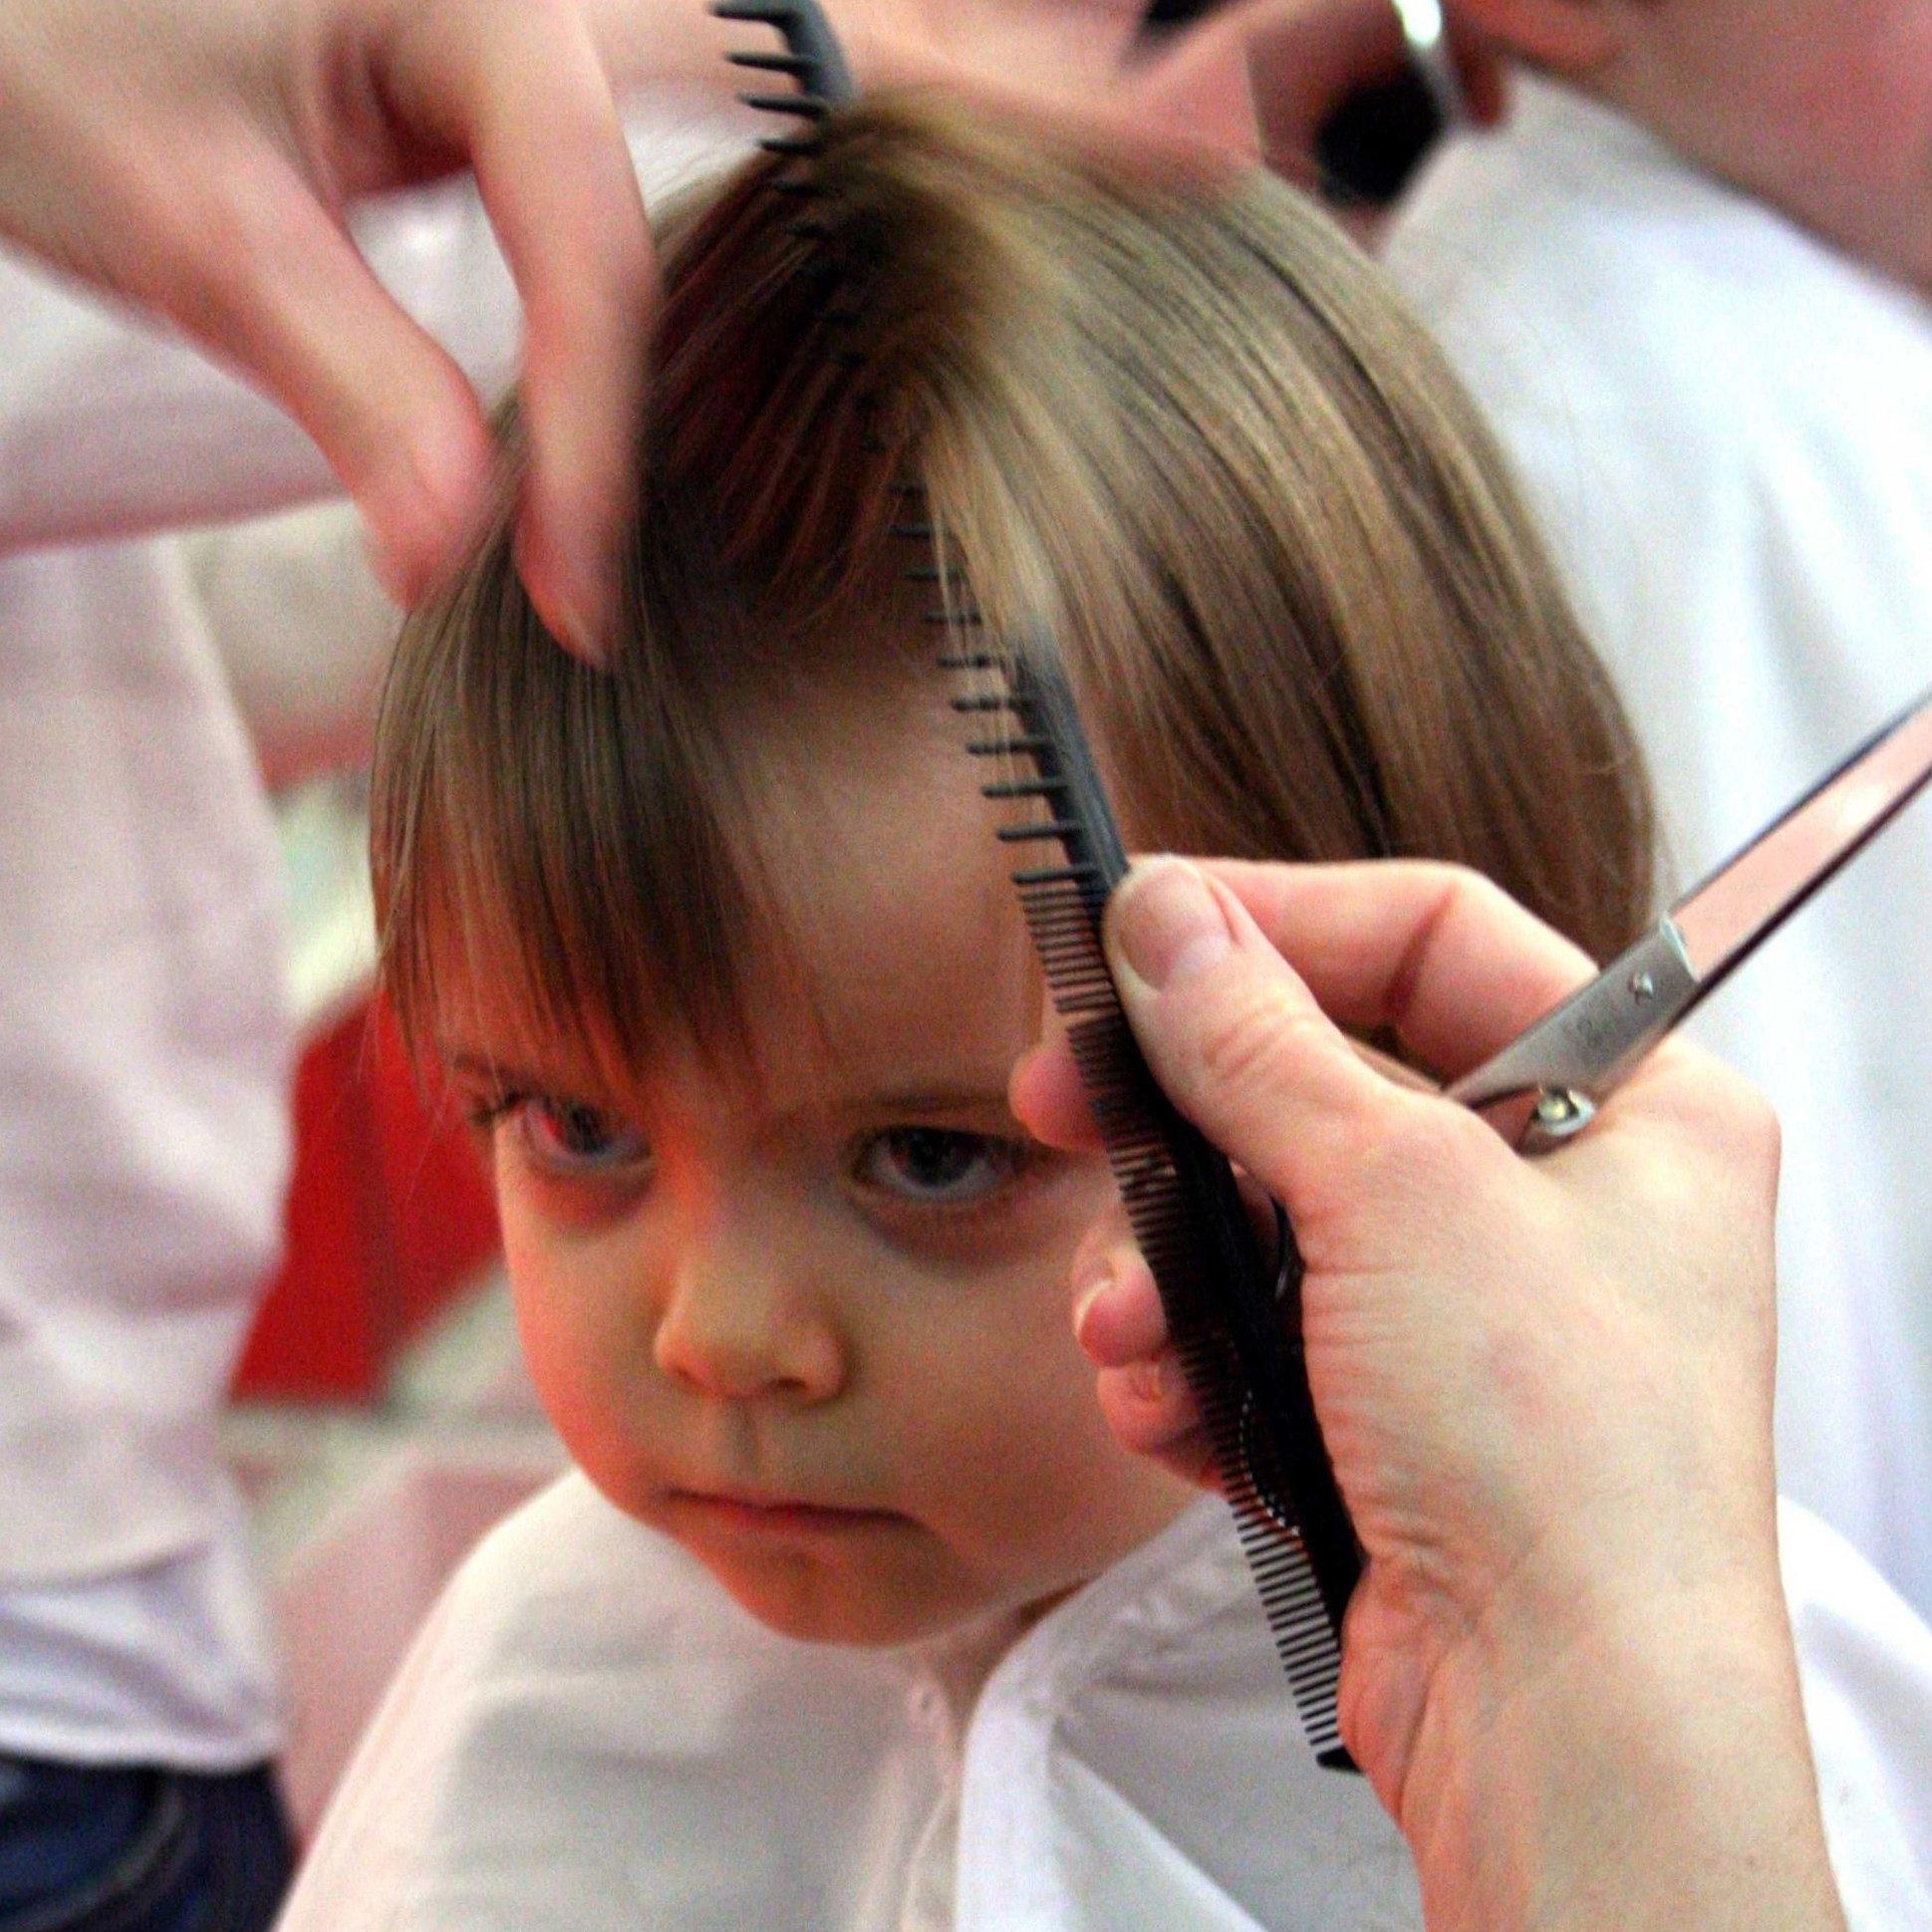 coiffure fille 2 ans tutoriels coiffures fille 2 ans coiffure simple et facile. Black Bedroom Furniture Sets. Home Design Ideas